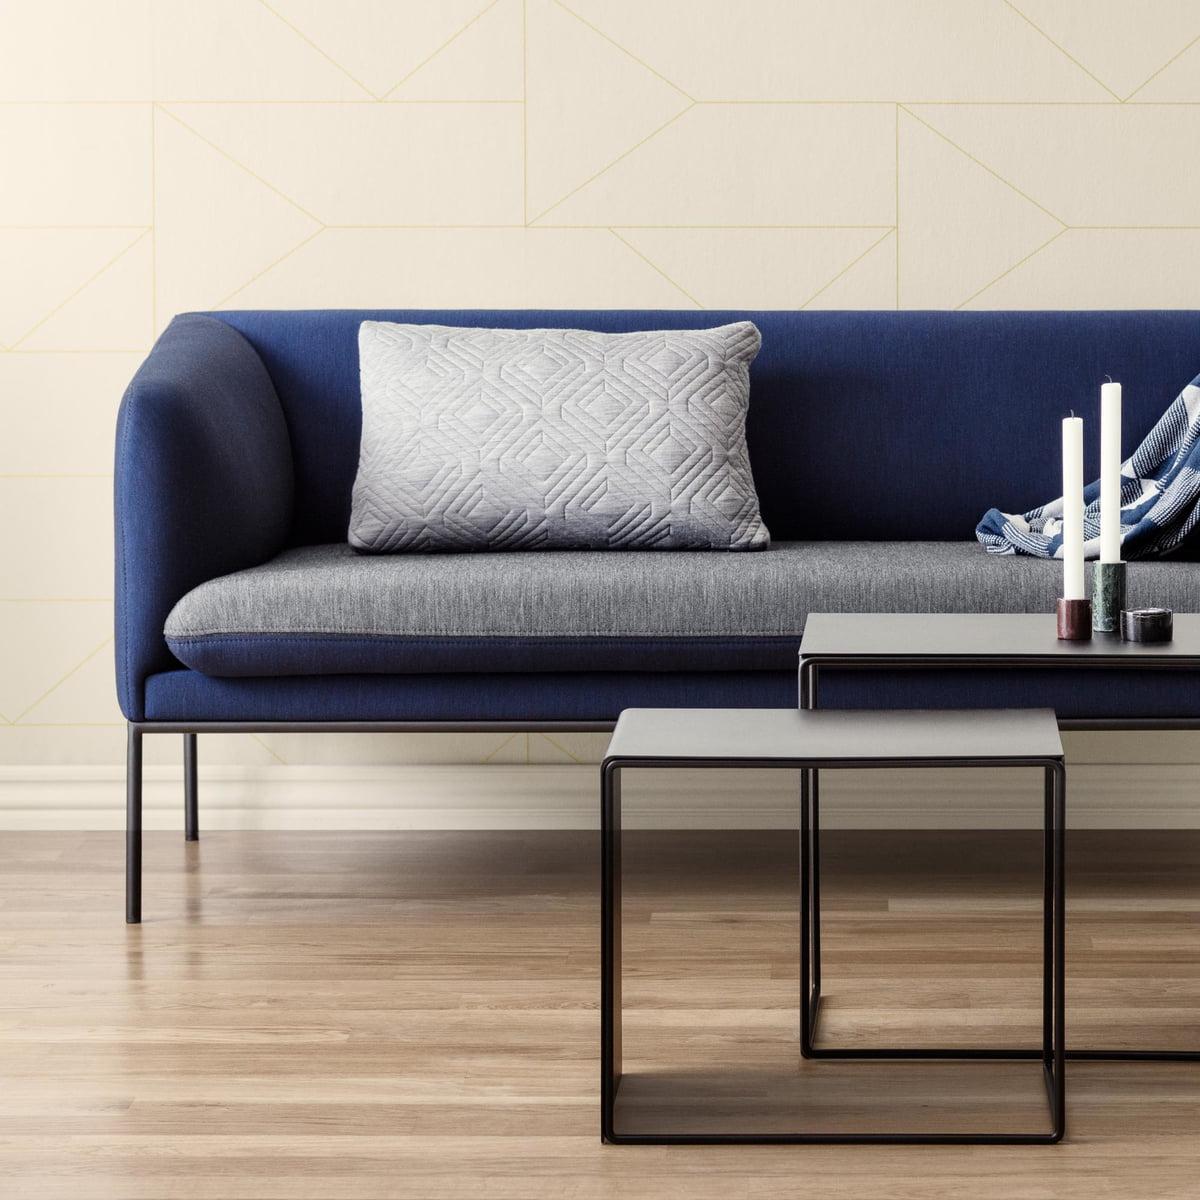 turn sofa 2 sitzer von ferm living. Black Bedroom Furniture Sets. Home Design Ideas